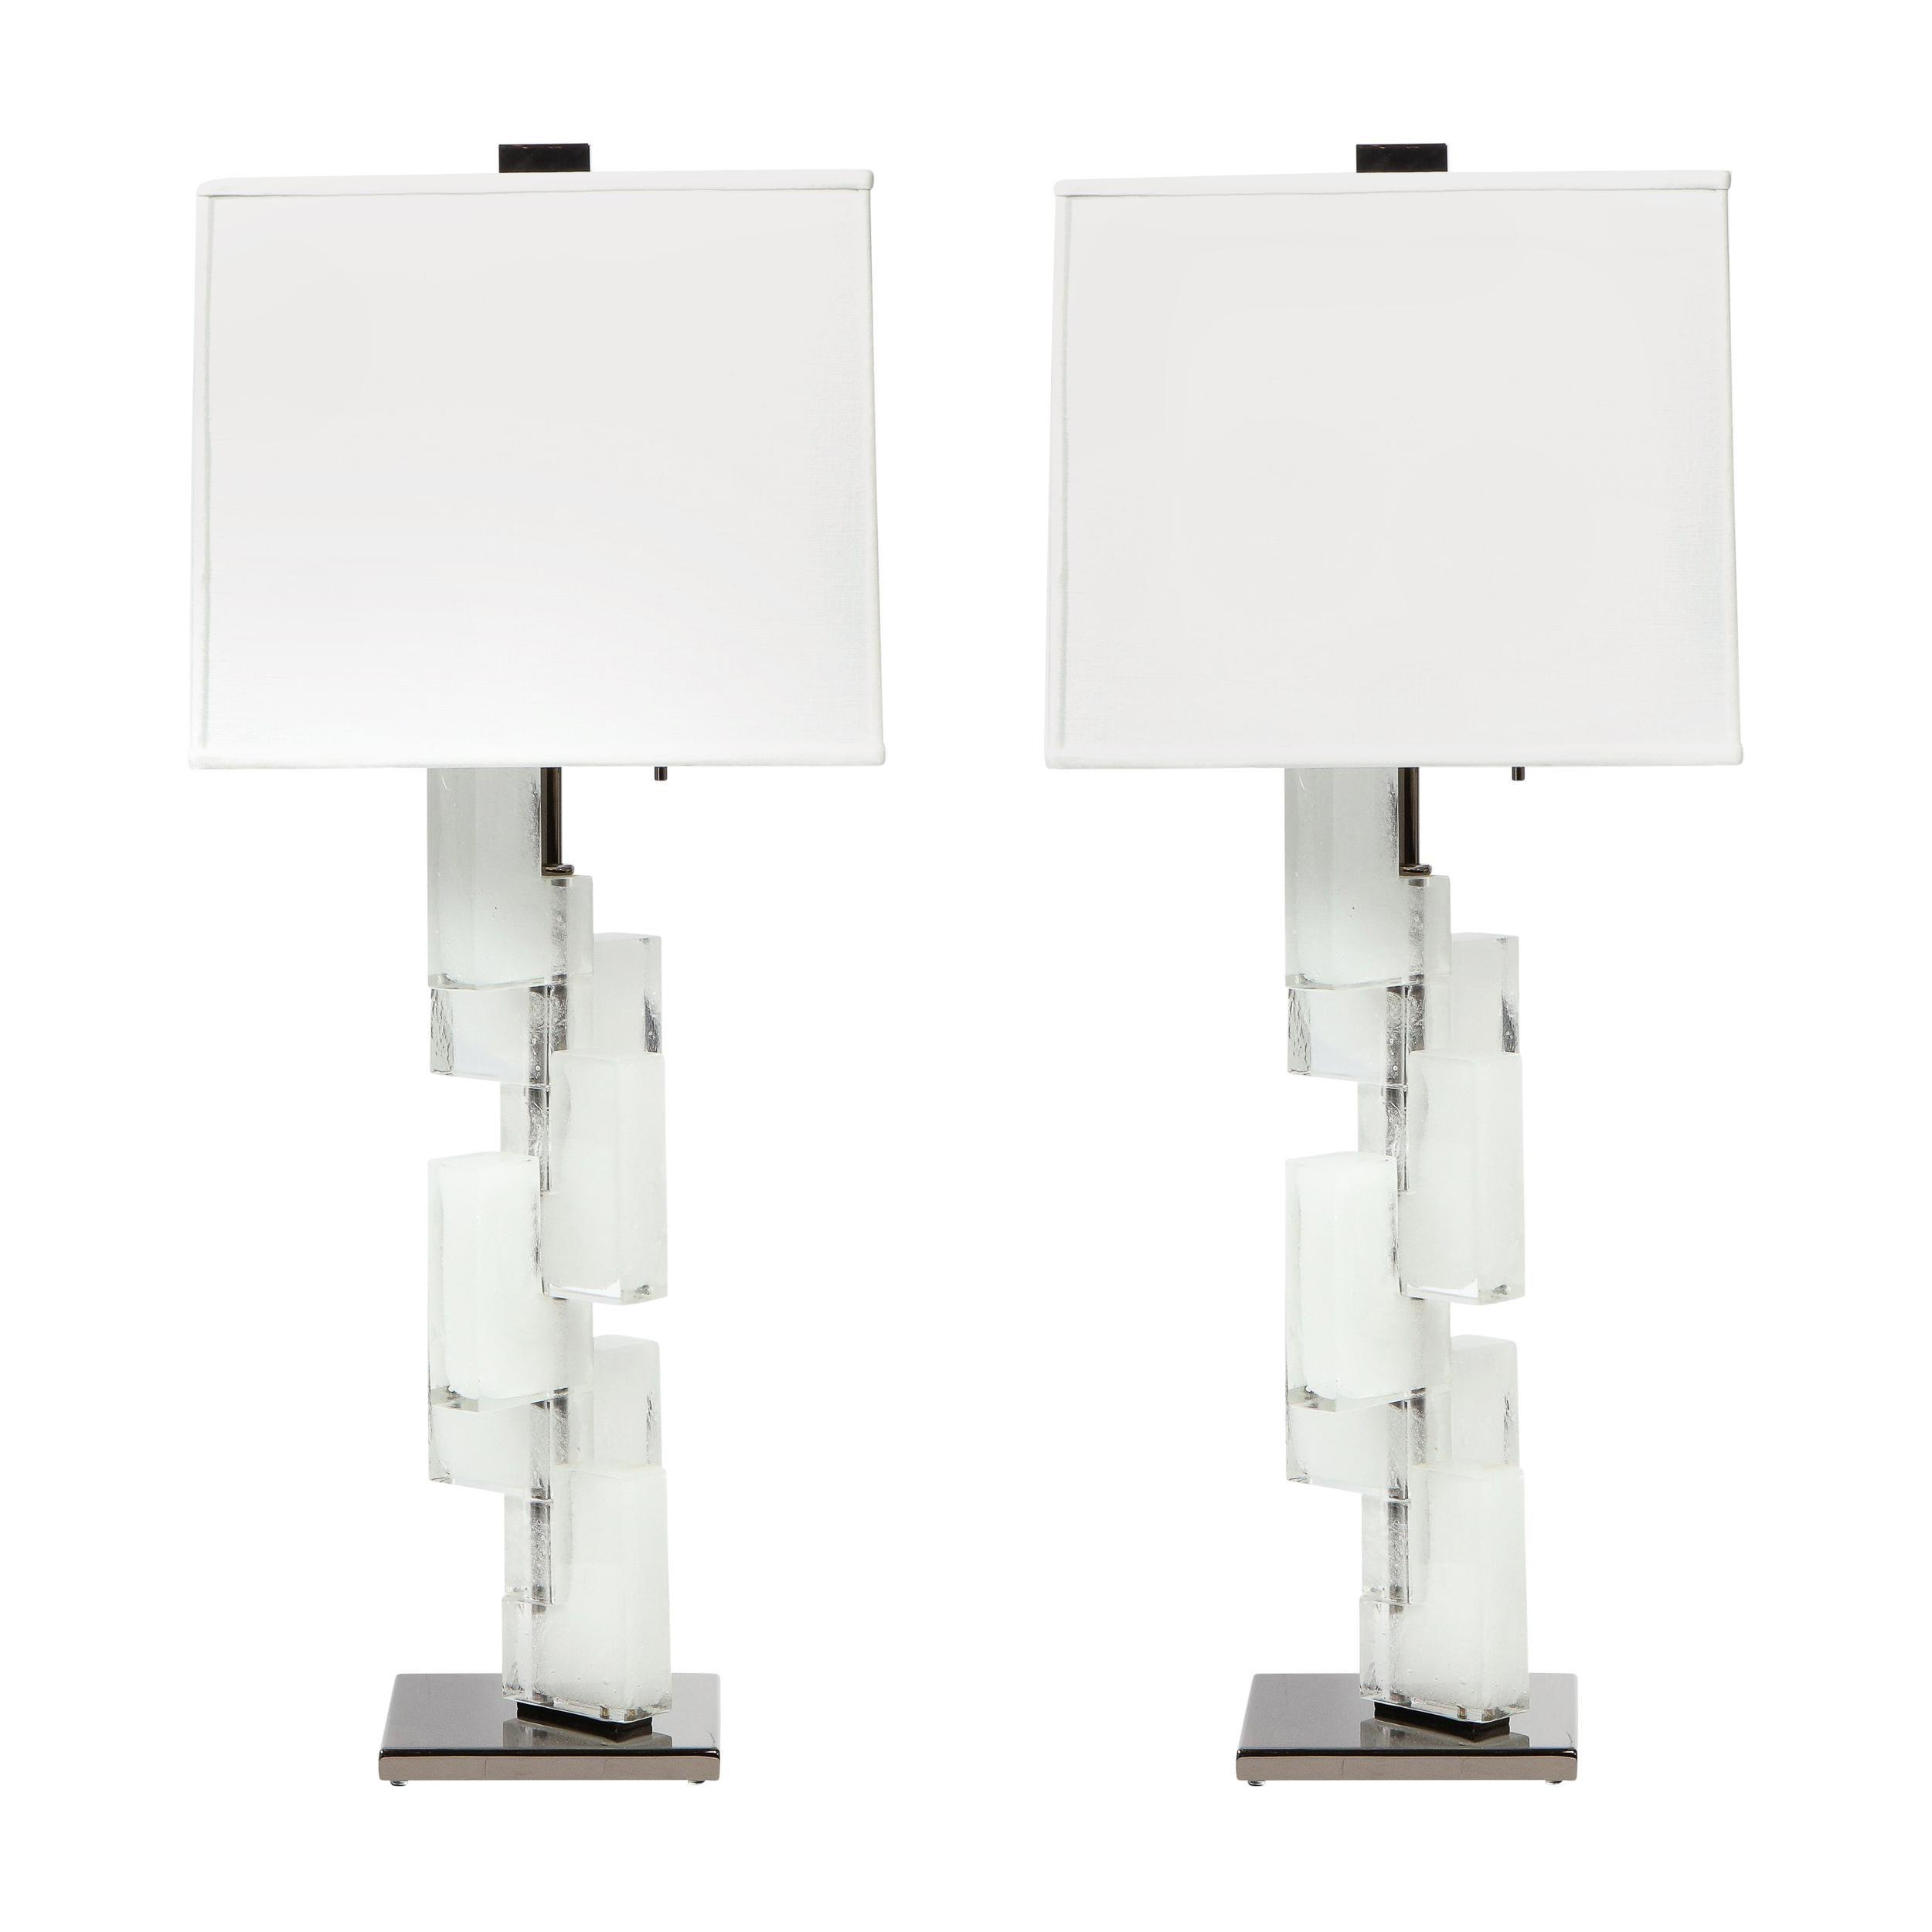 Pair of Modernist Handblown Murano Ice Glass Table Lamps w/ Gunmetal Fittings